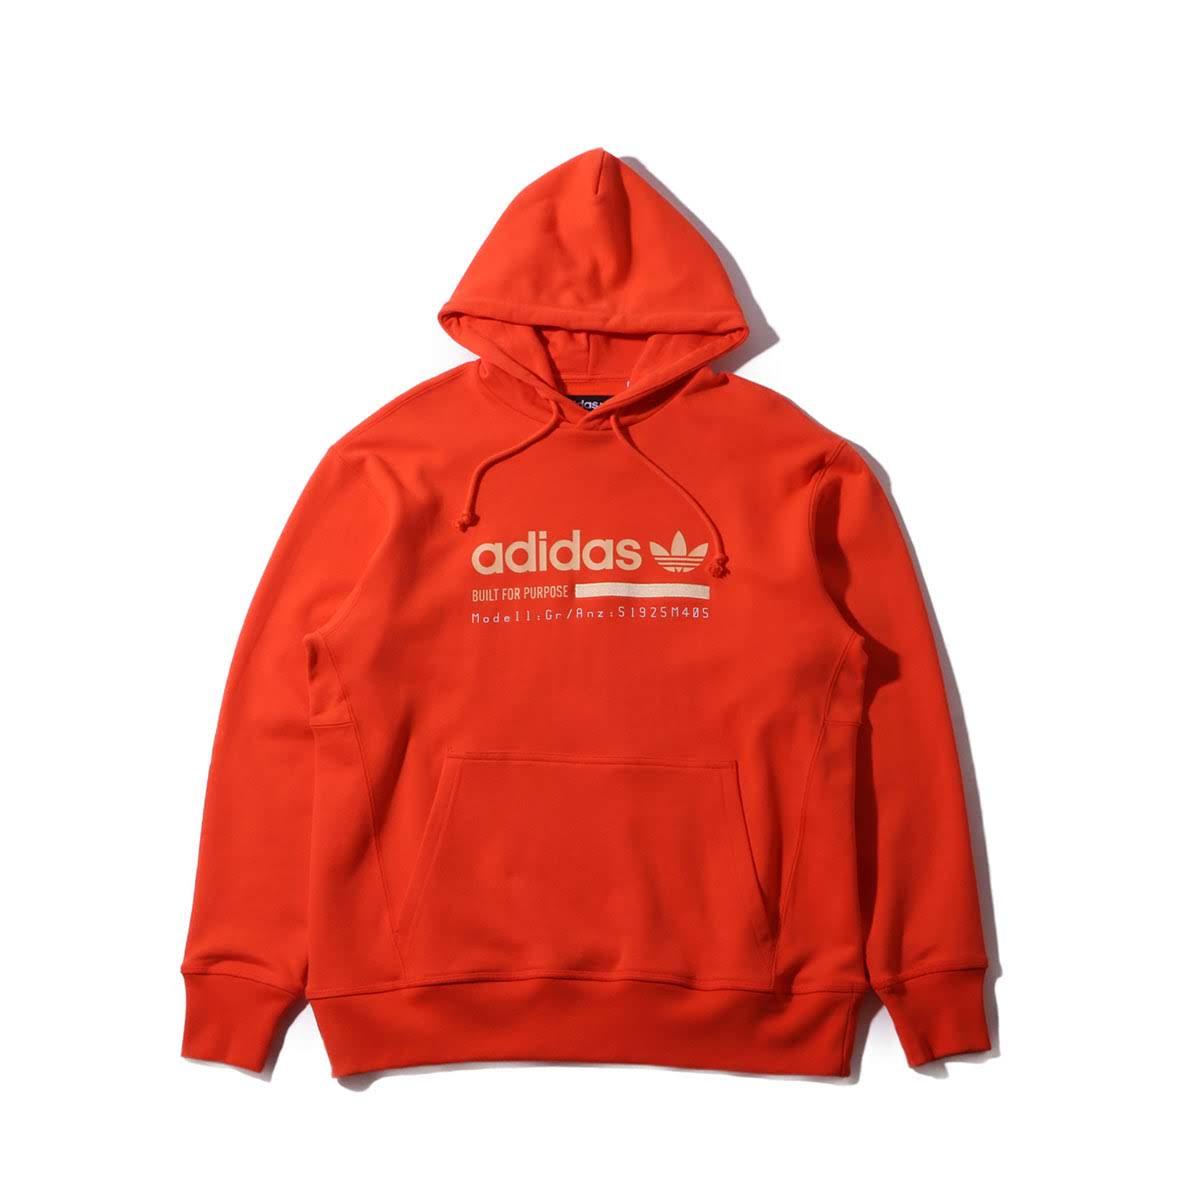 adidas Originals KAVAL OTH HOODIE(SEMI SOLAR RED)(アディダスオリジナルス カバル OTH フーディー)【メンズ】【パーカー】【19SS-I】